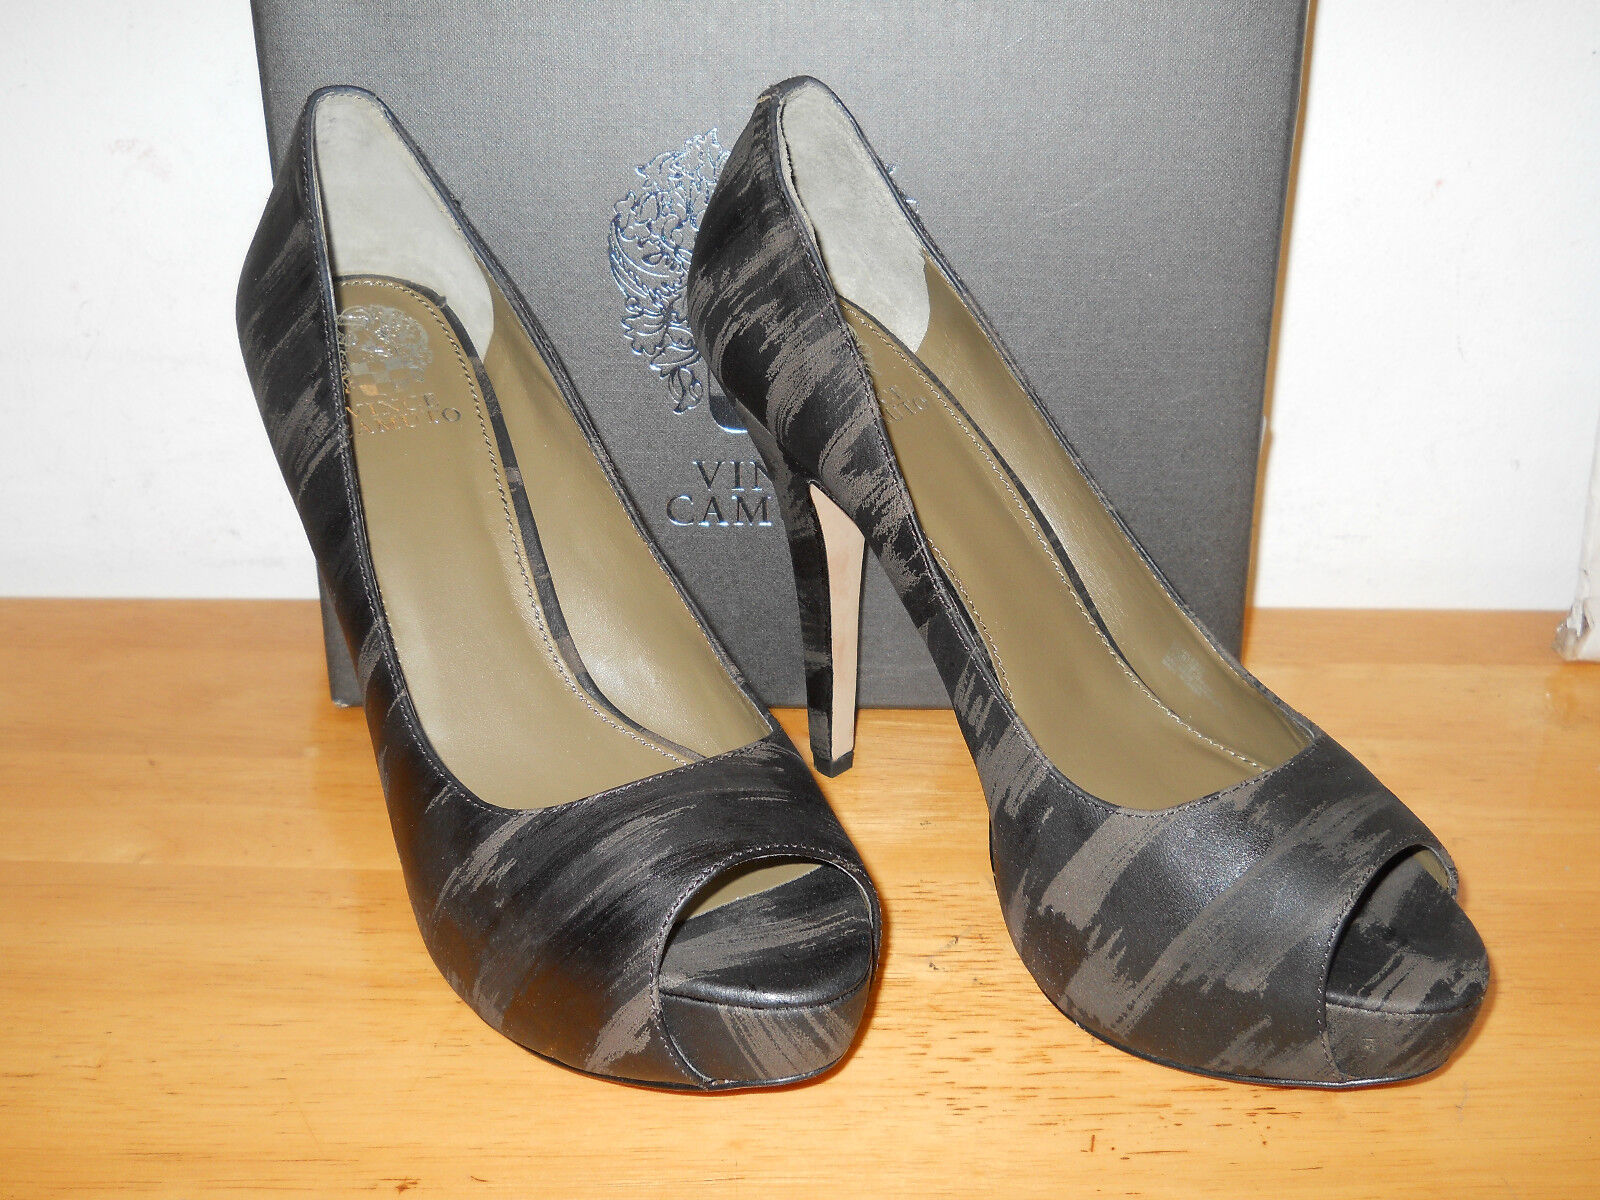 Vince Camuto New Donna Milesy2 Khaki Combo Open Toe Heels 9.5 M Shoes NWB